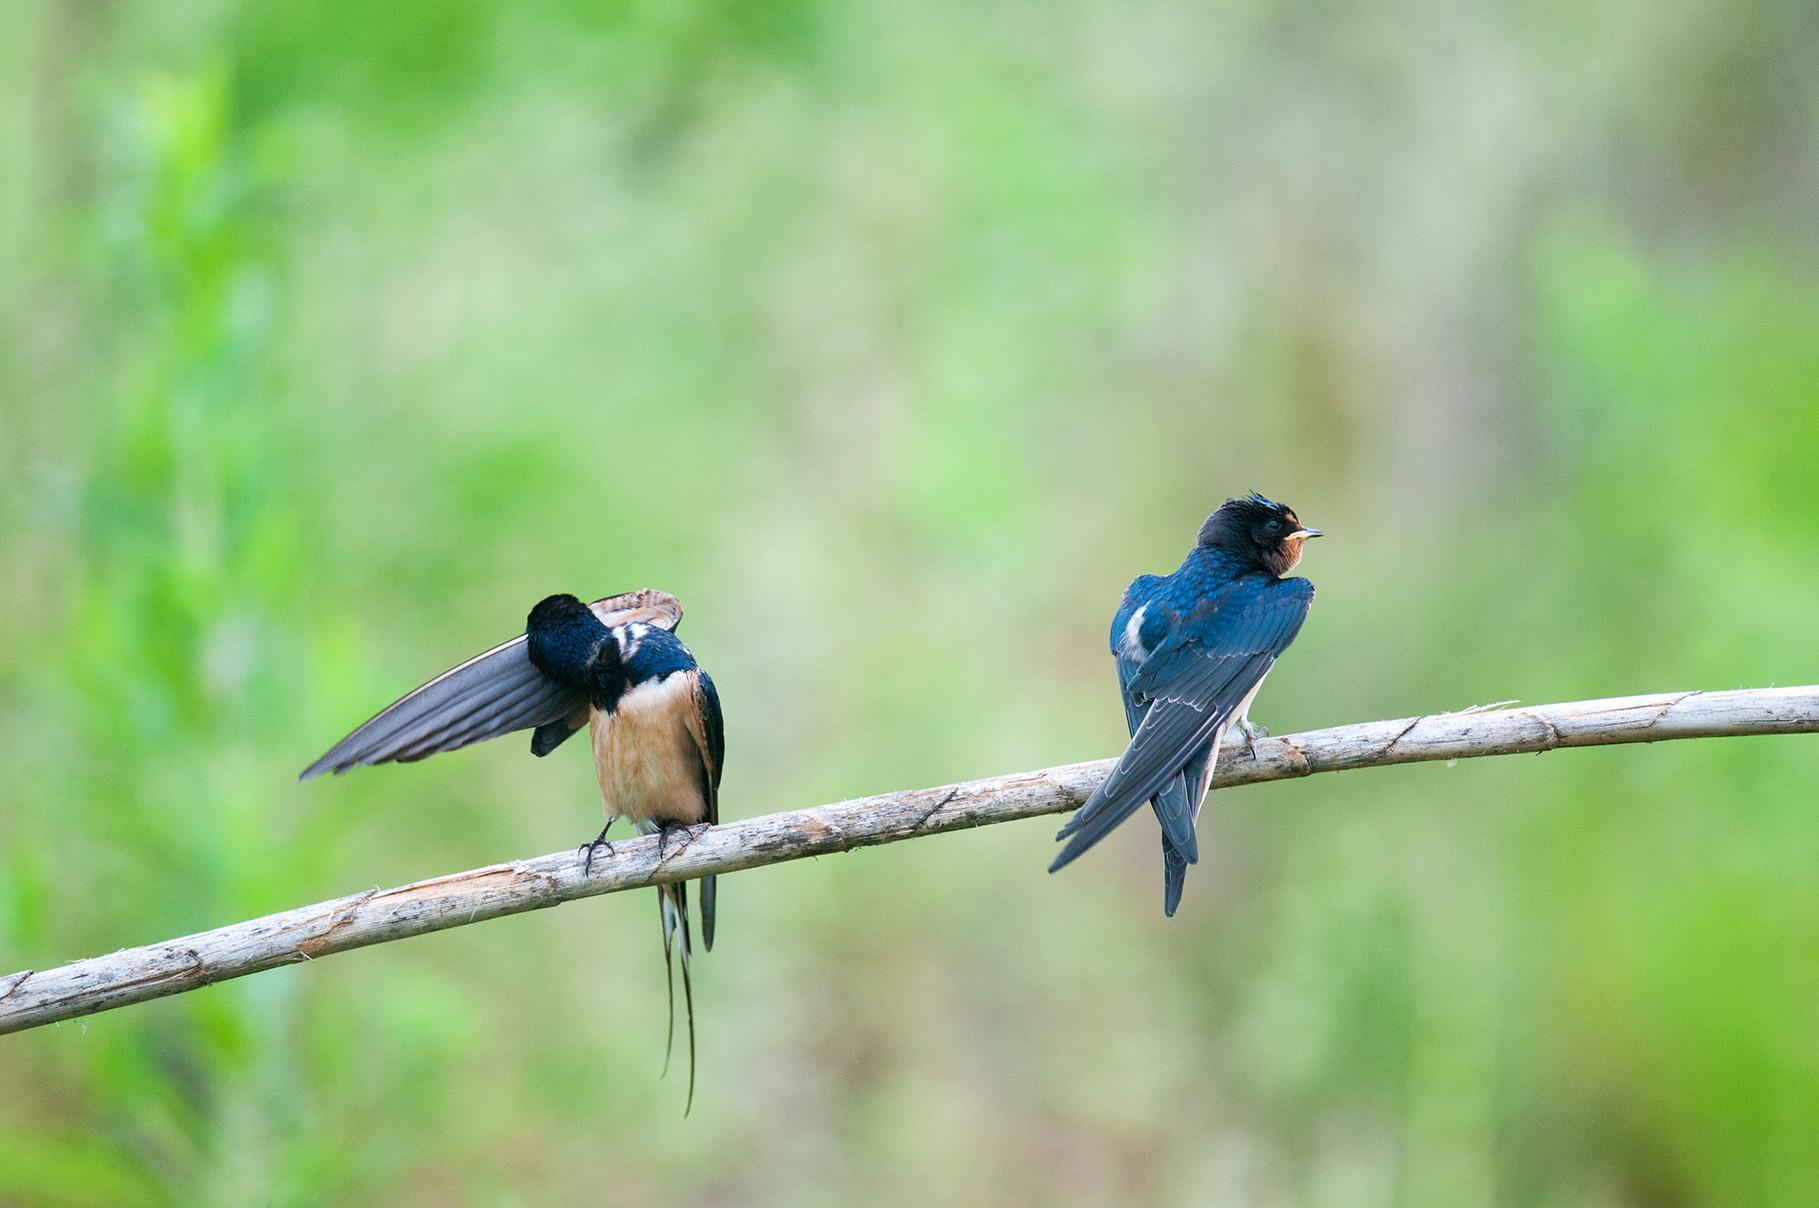 Rondine comune - Barn Swallow